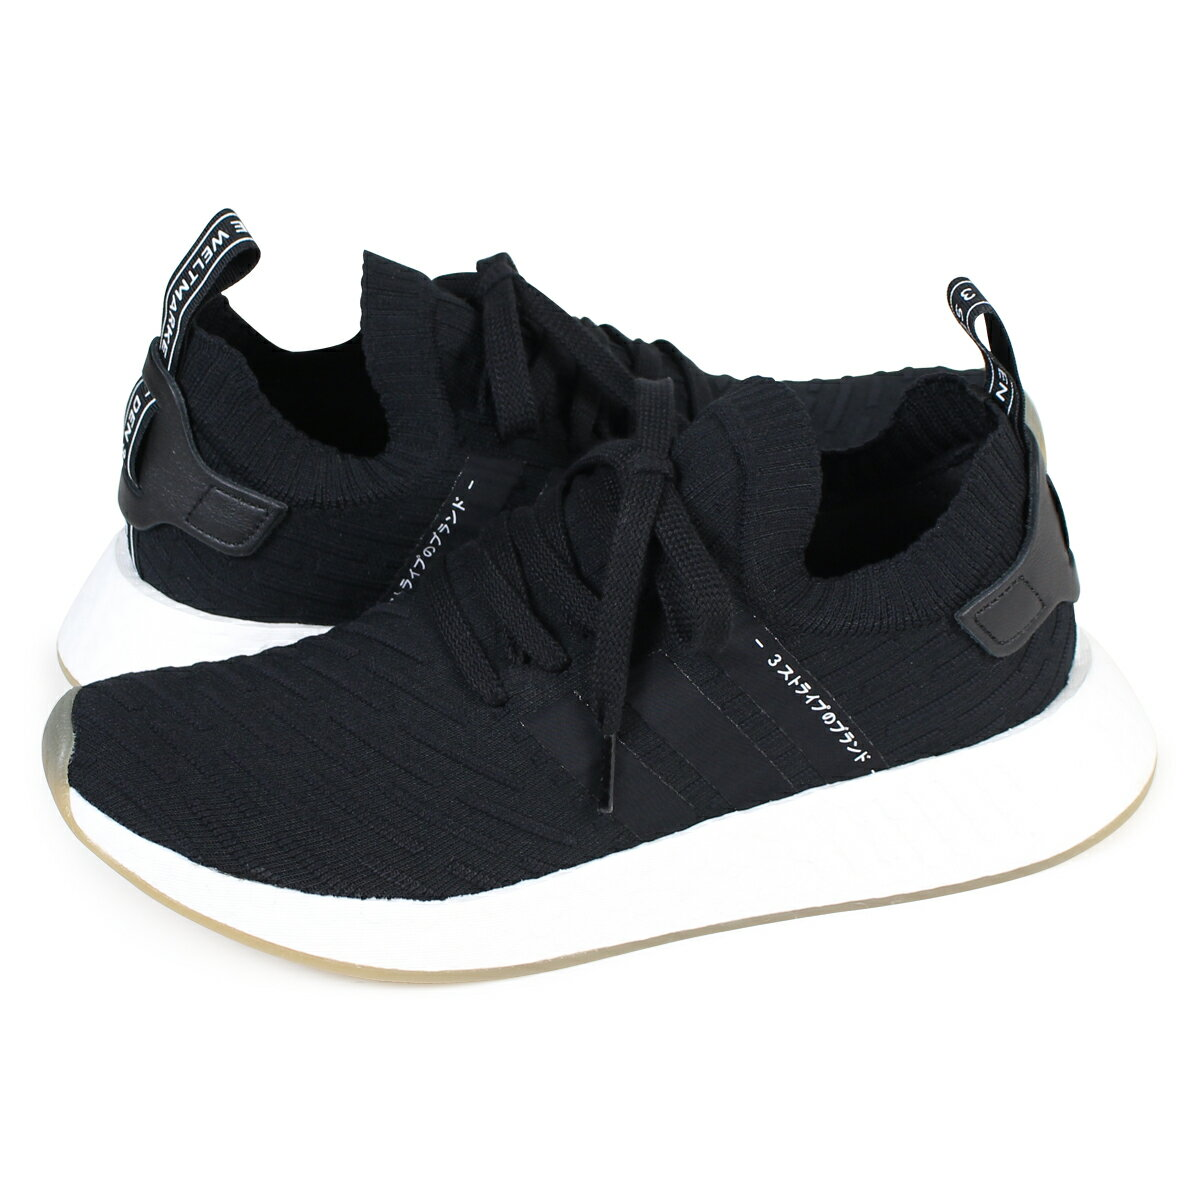 adidas originals NMD R1 PK アディダス スニーカー ノマド メンズ BY9696 靴 ブラック [10/28 新入荷]